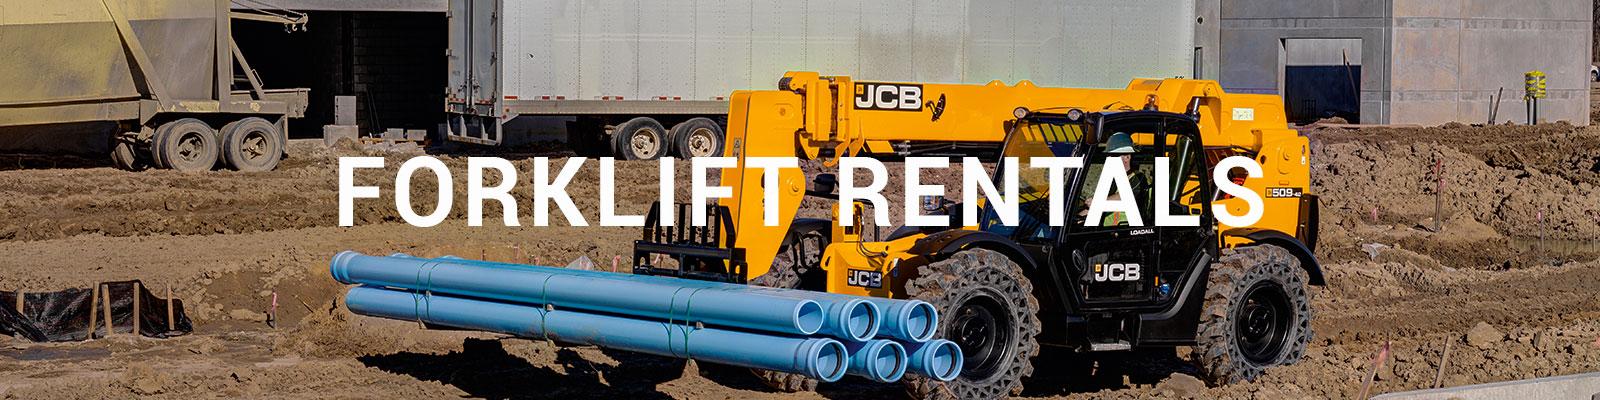 Forklift Rentals in NY, NJ, CT   Durante Rentals   Telehandlers